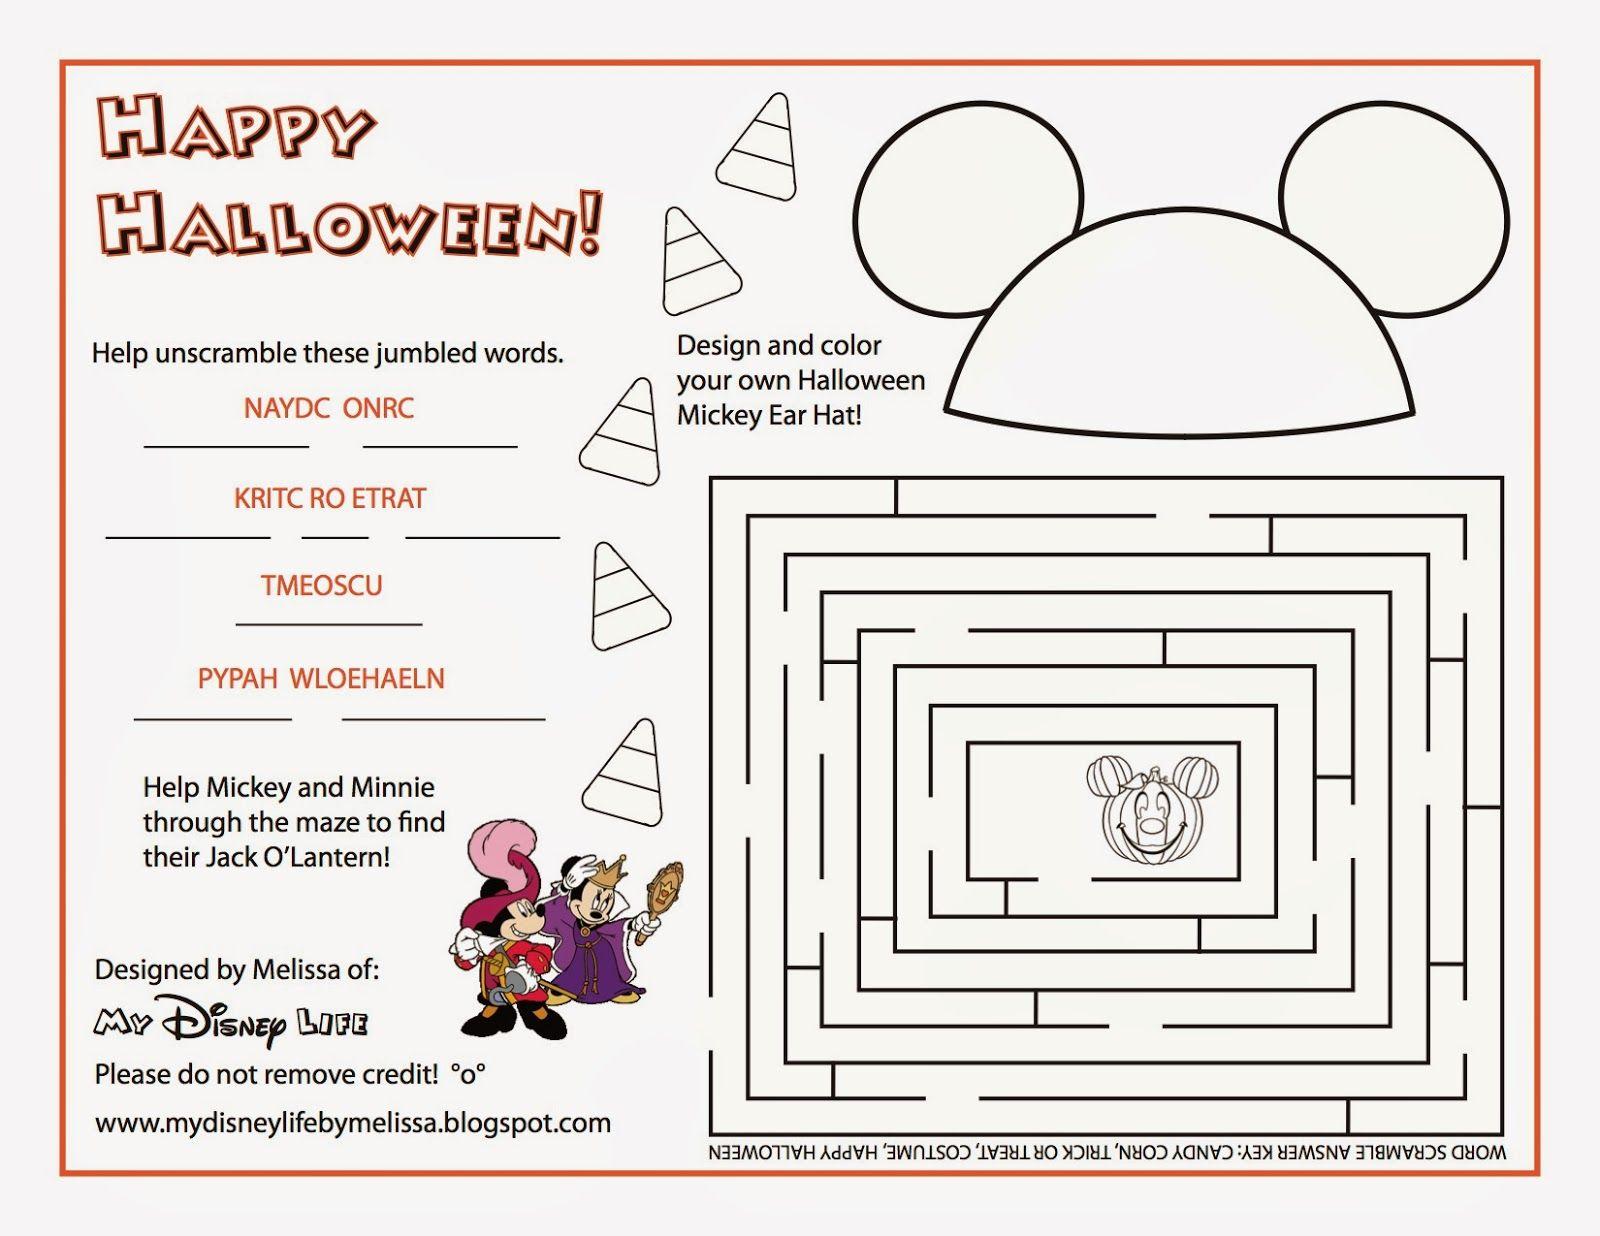 my disney life: free printable halloween activity sheet | disney <3